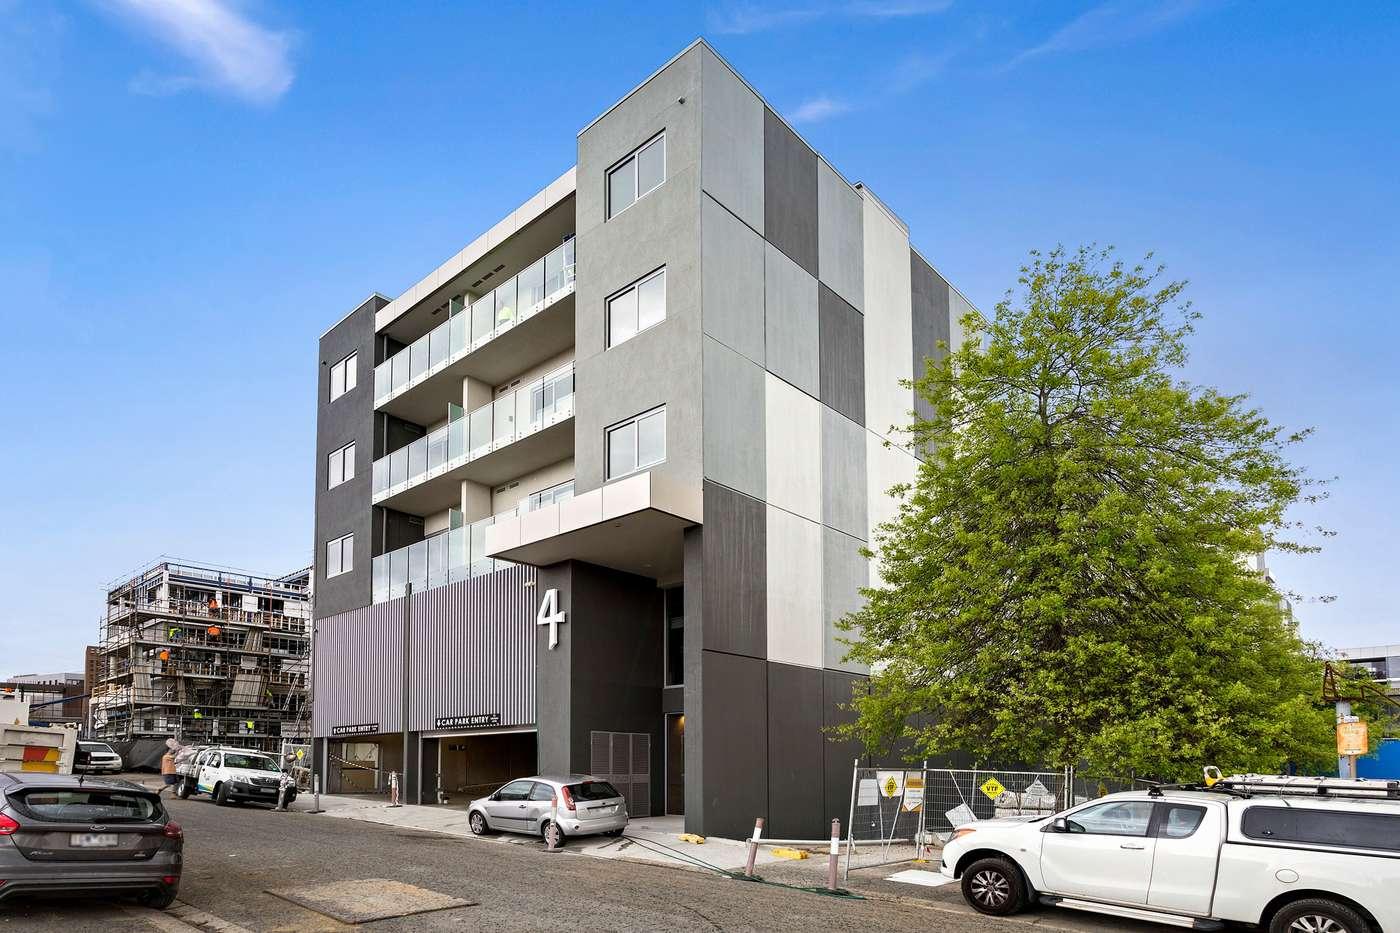 Main view of Homely apartment listing, 306/4 Villa Street, Heidelberg, VIC 3084